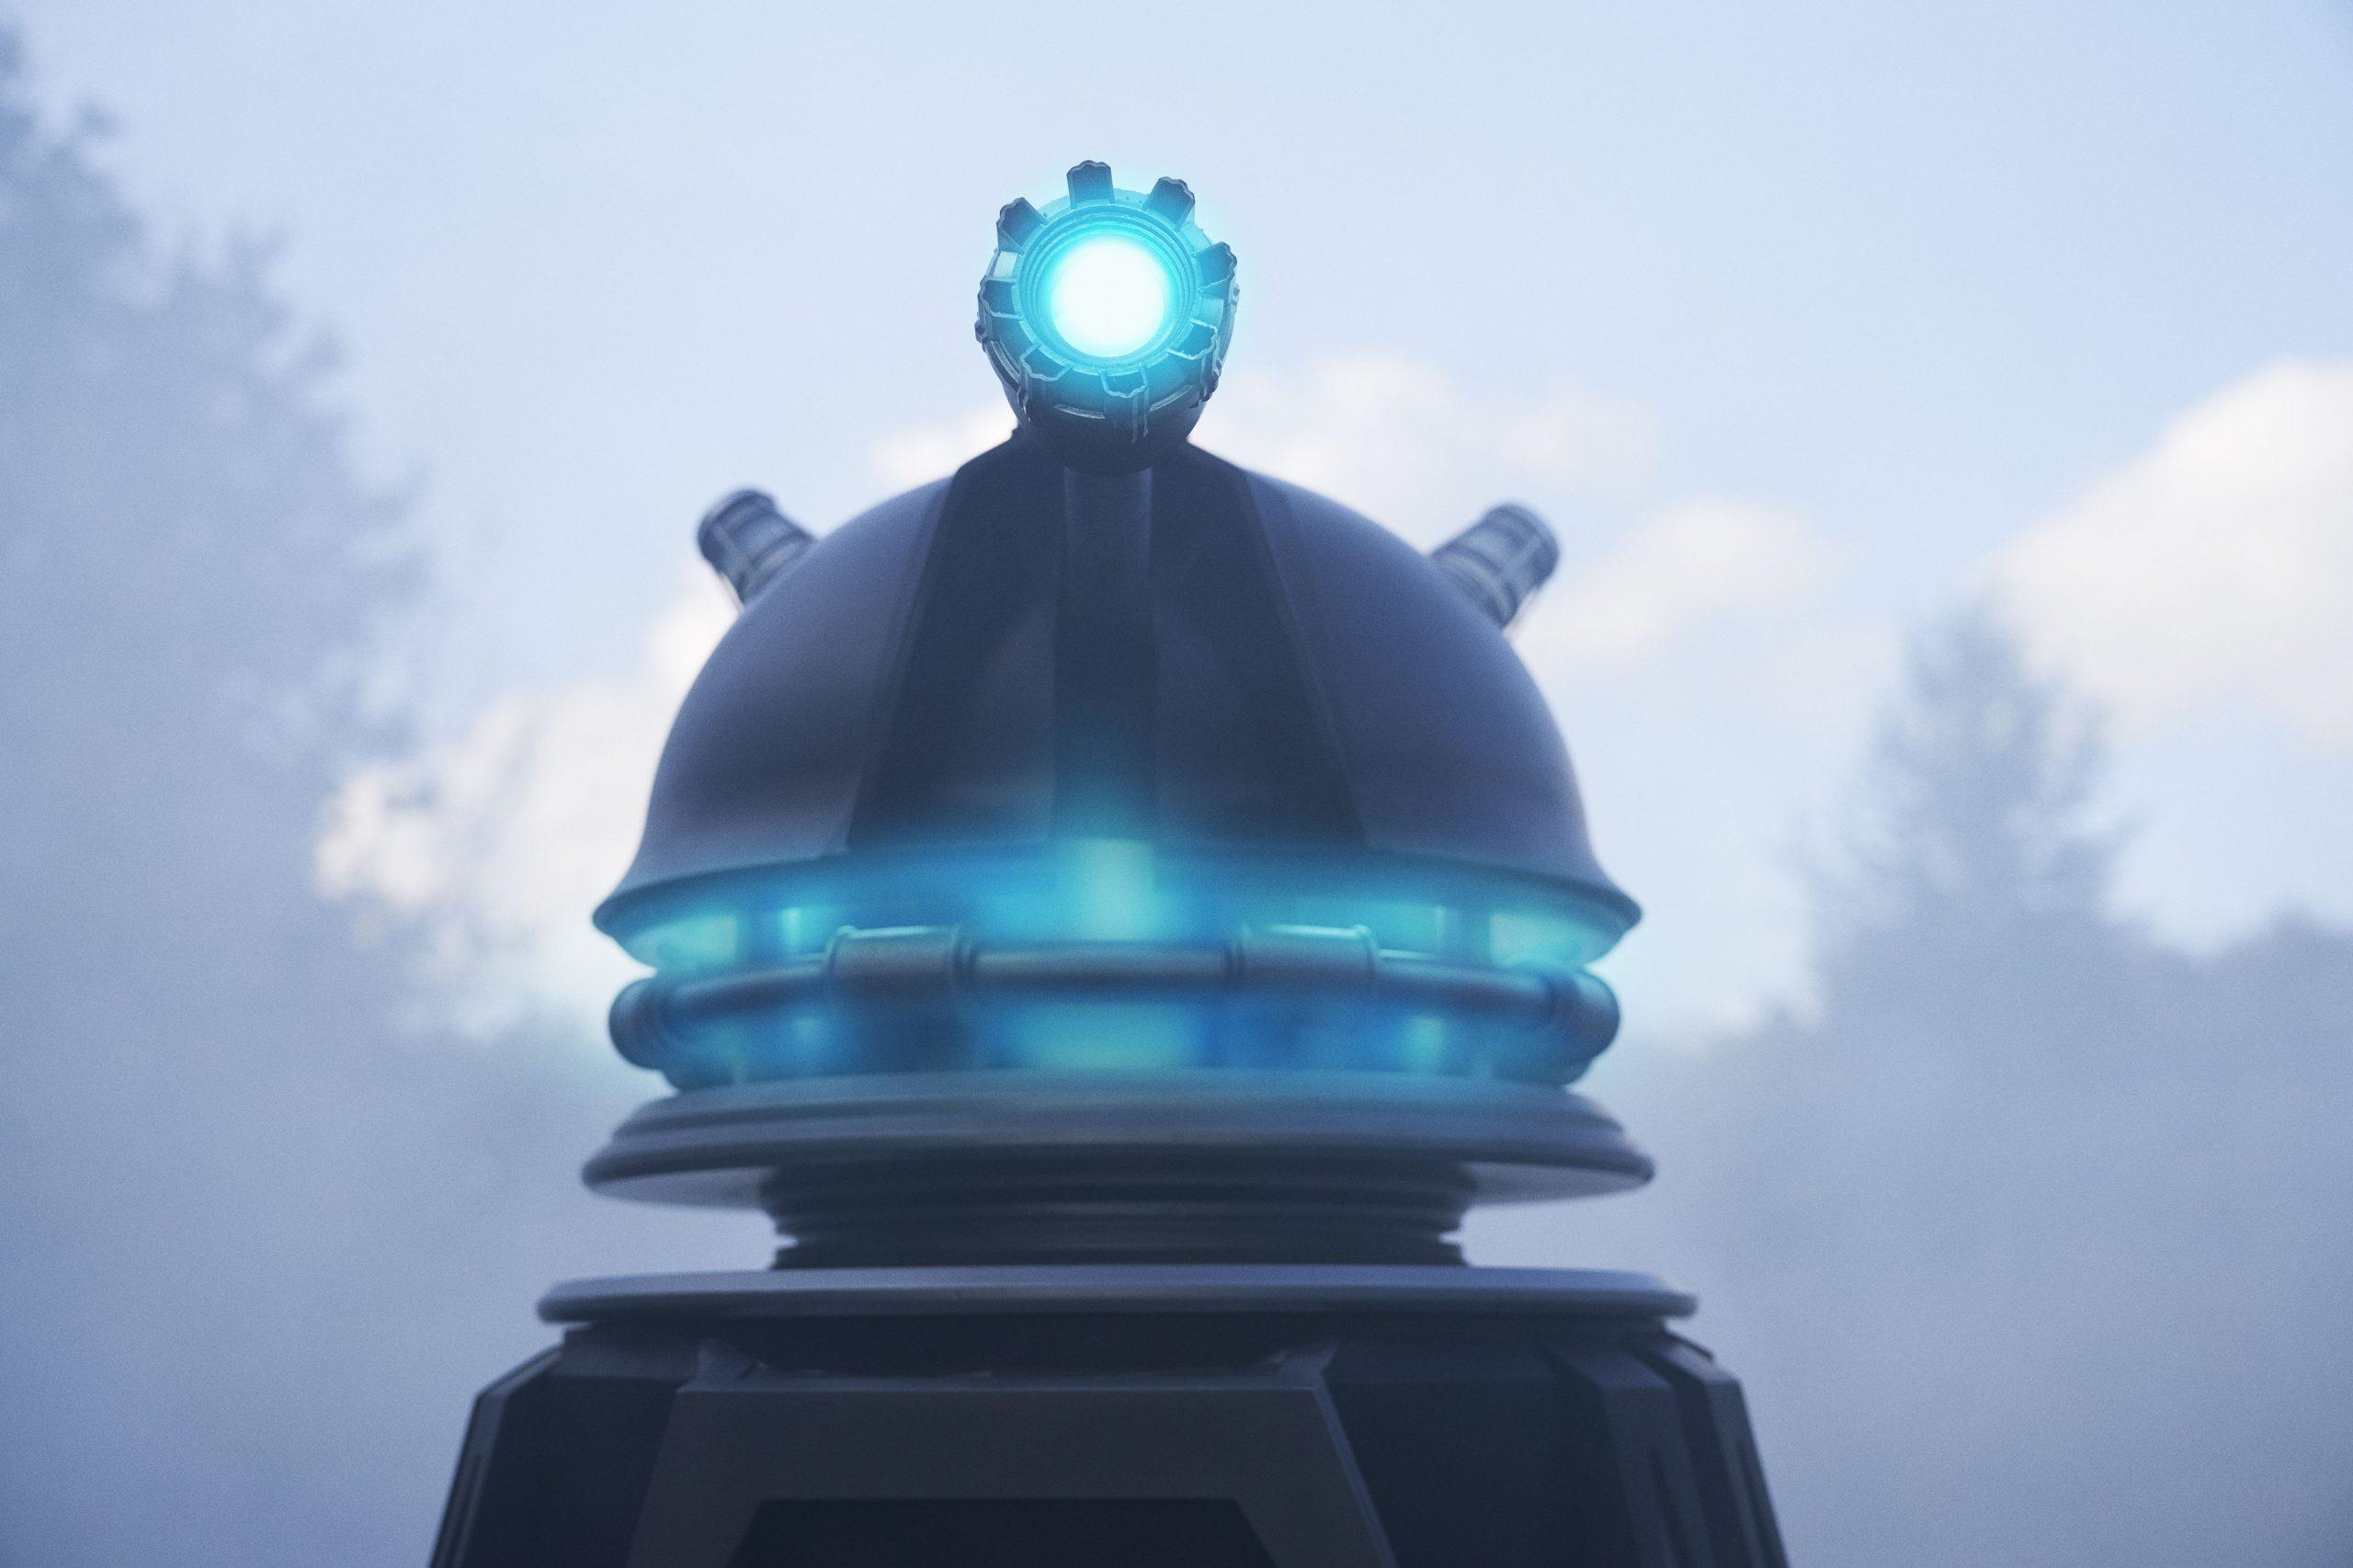 Doctor Who Special 2020 - Revolution Of The Daleks Picture Shows: Dalek - (C) BBC Studios - Photographer: Ben Blackall